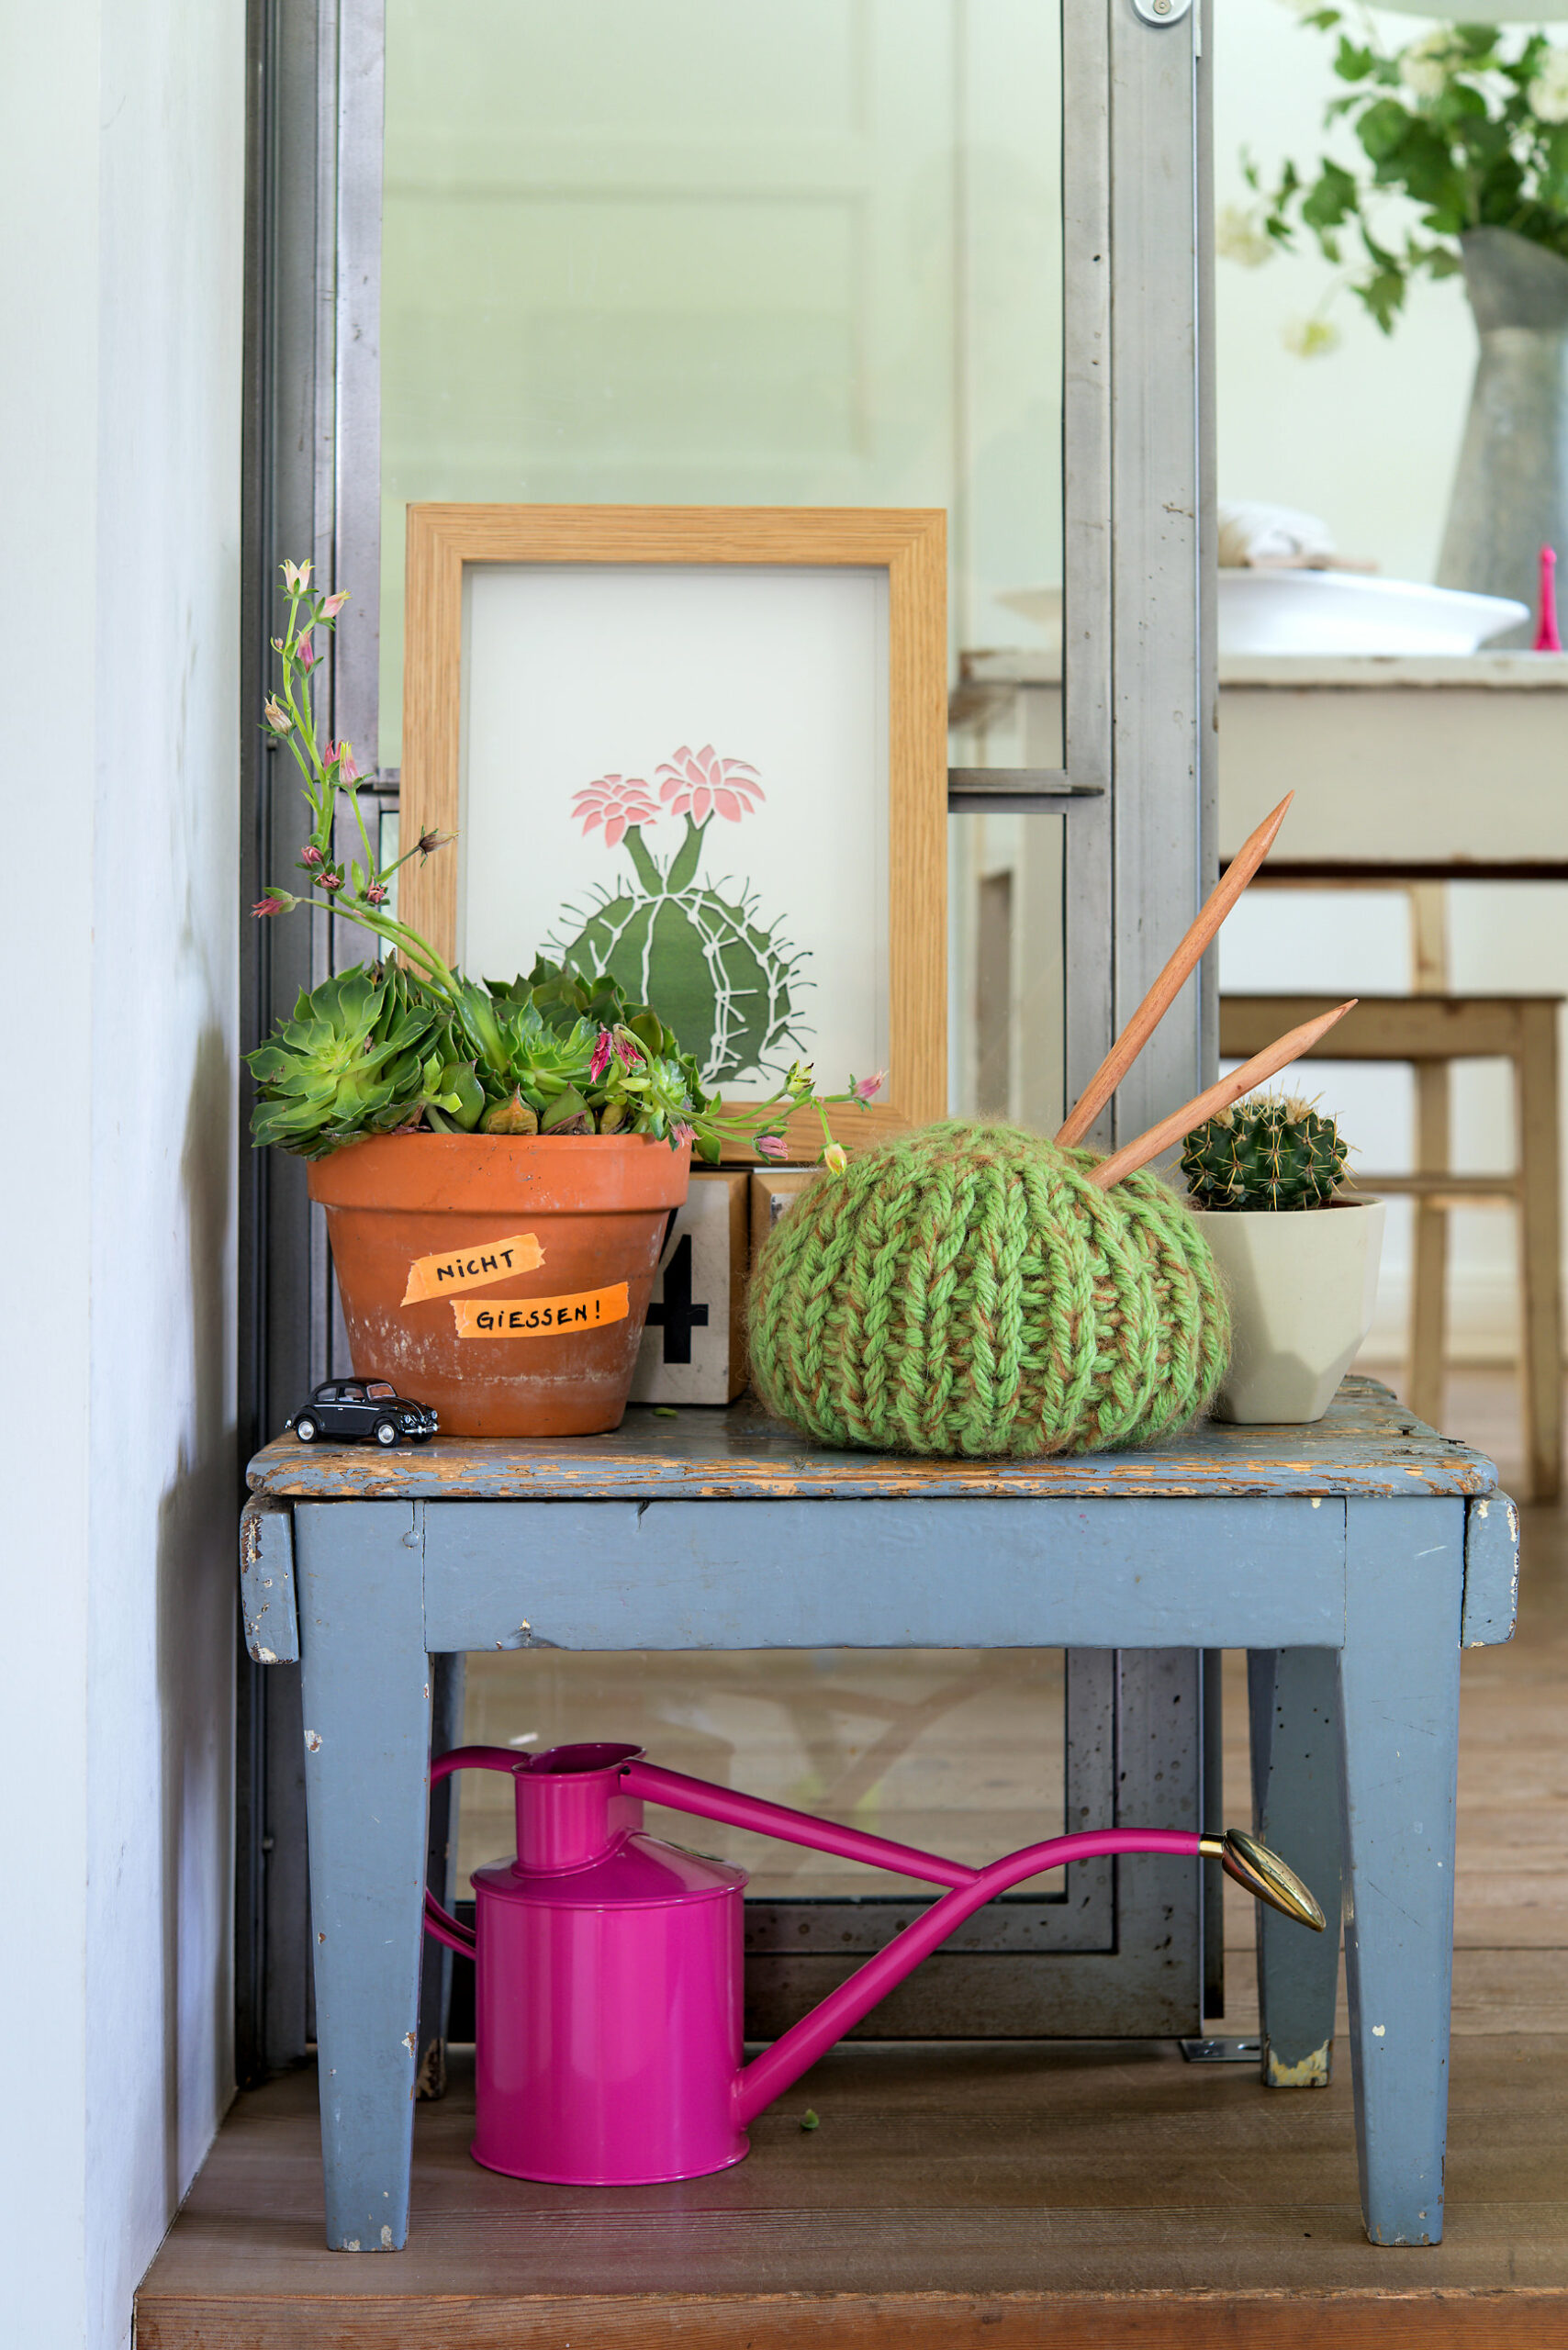 Strick-Kaktus